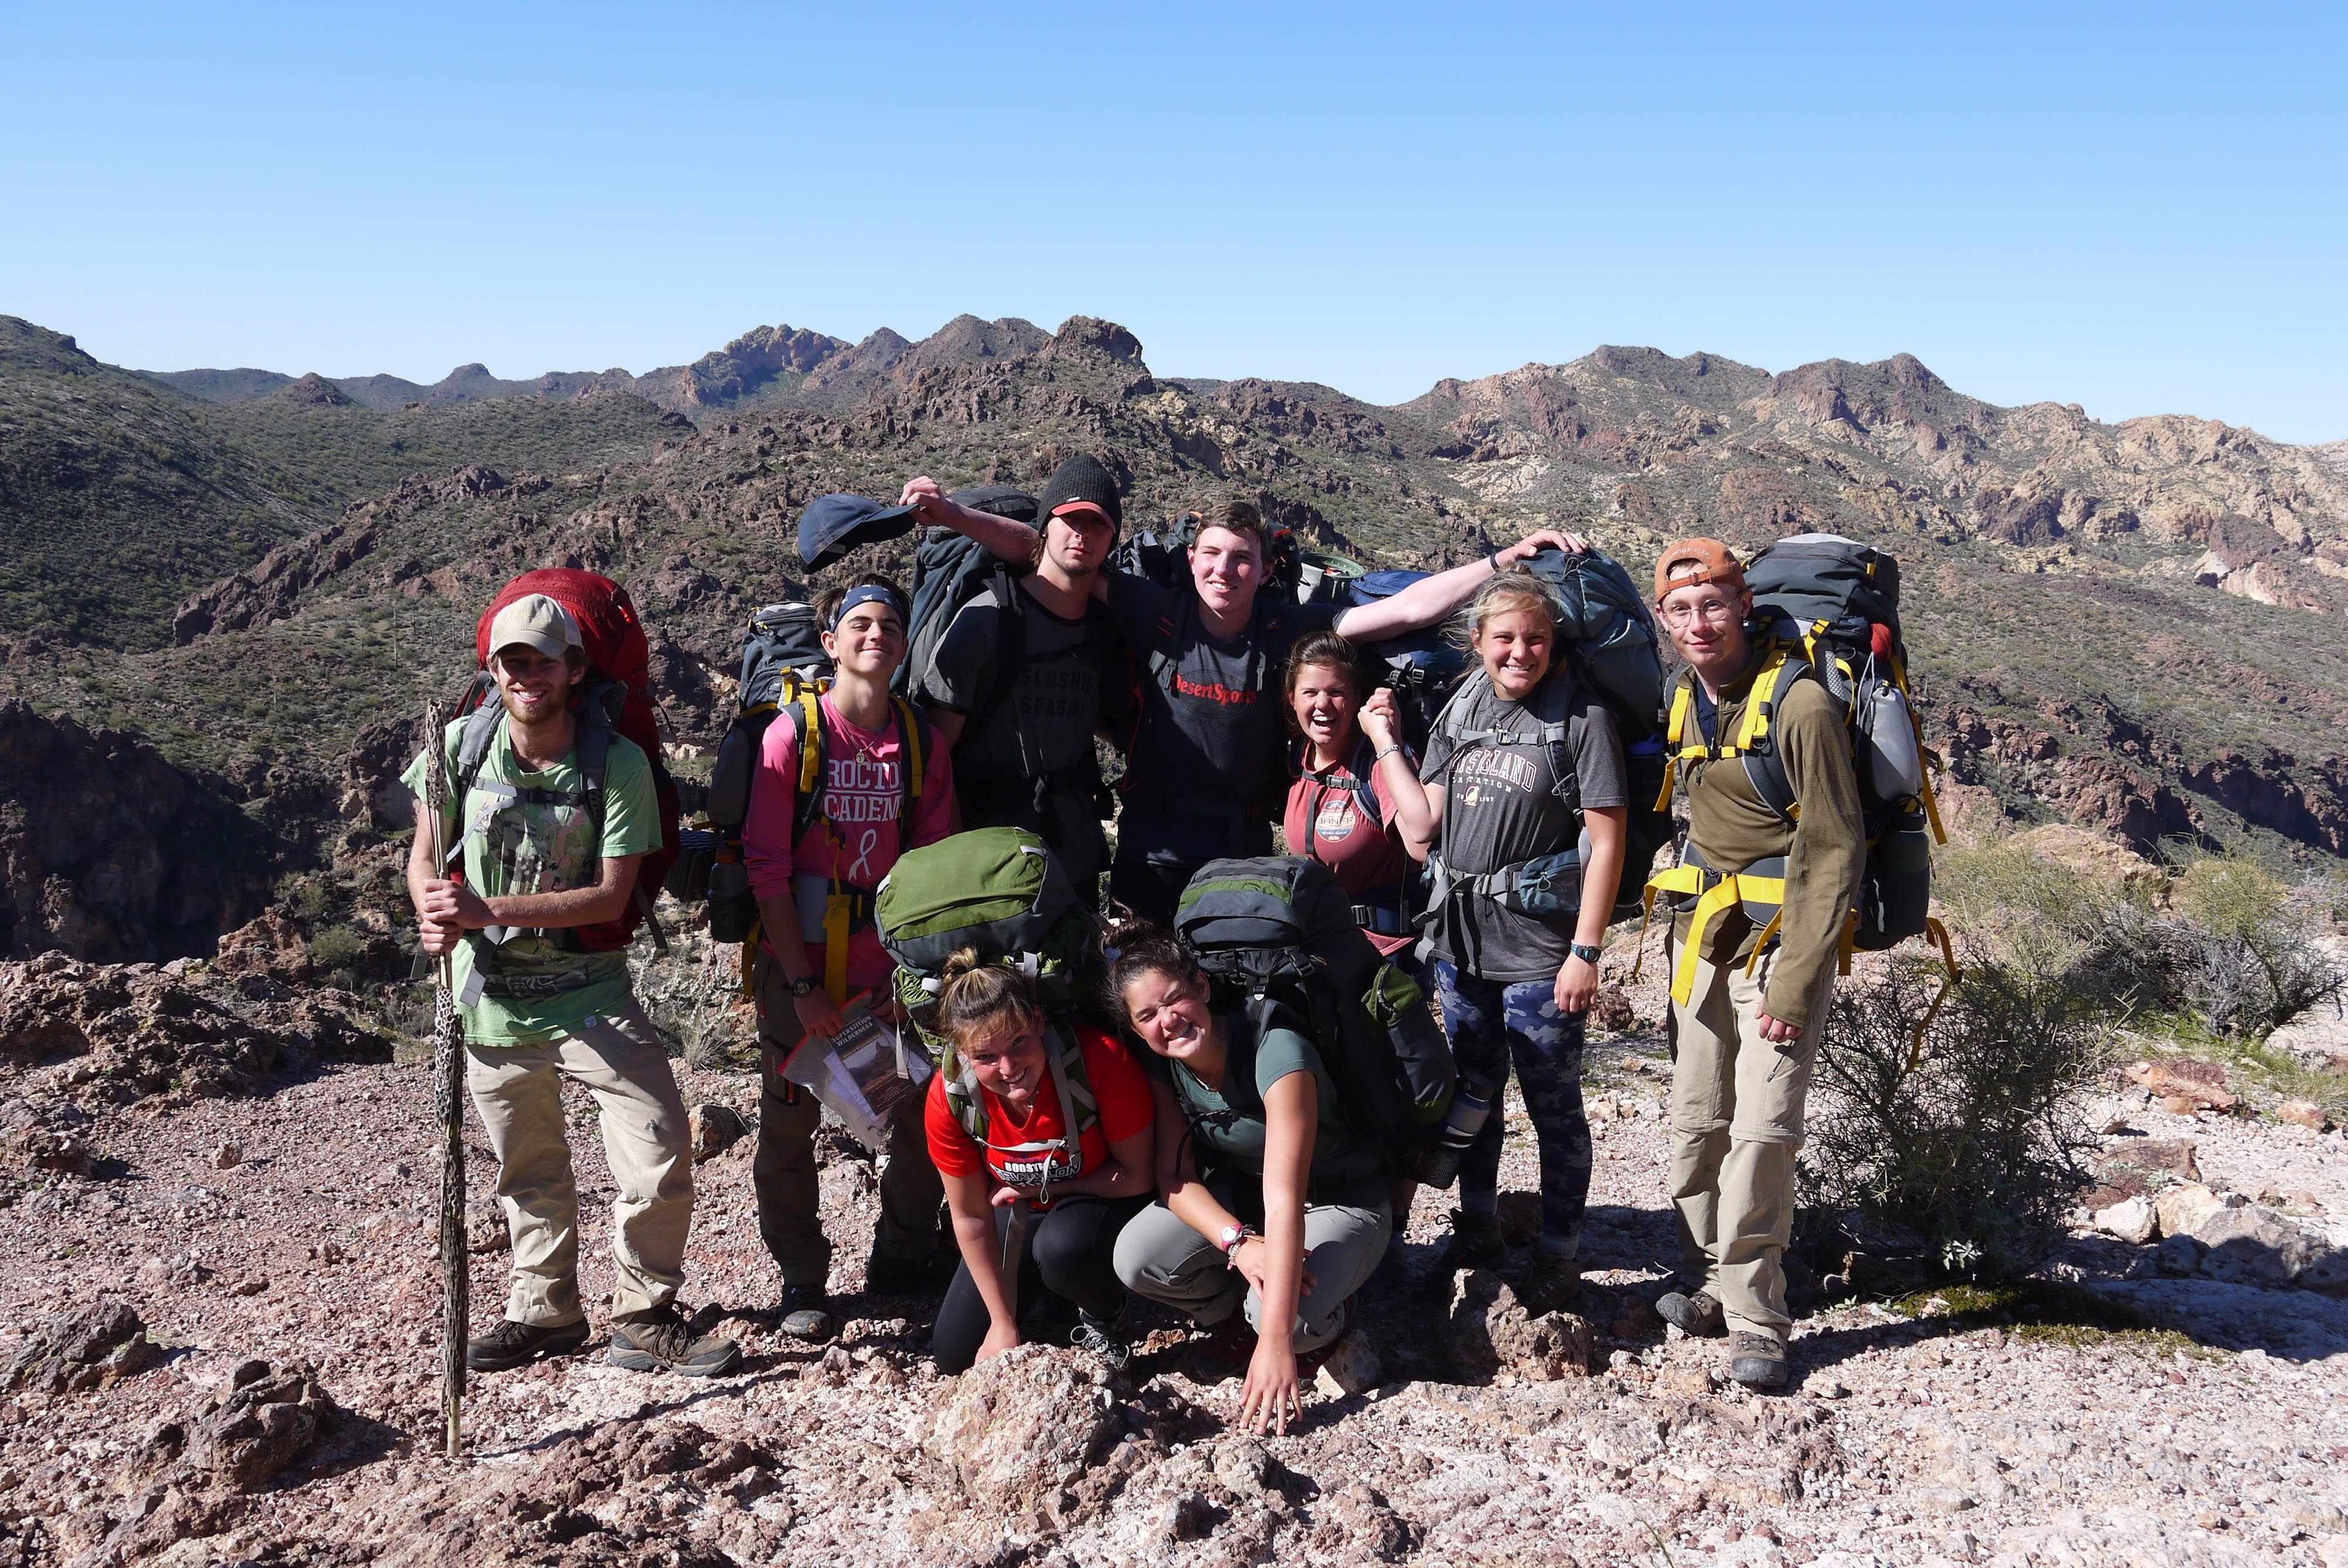 Proctor Academy Mountain Classroom Study Abroad Program